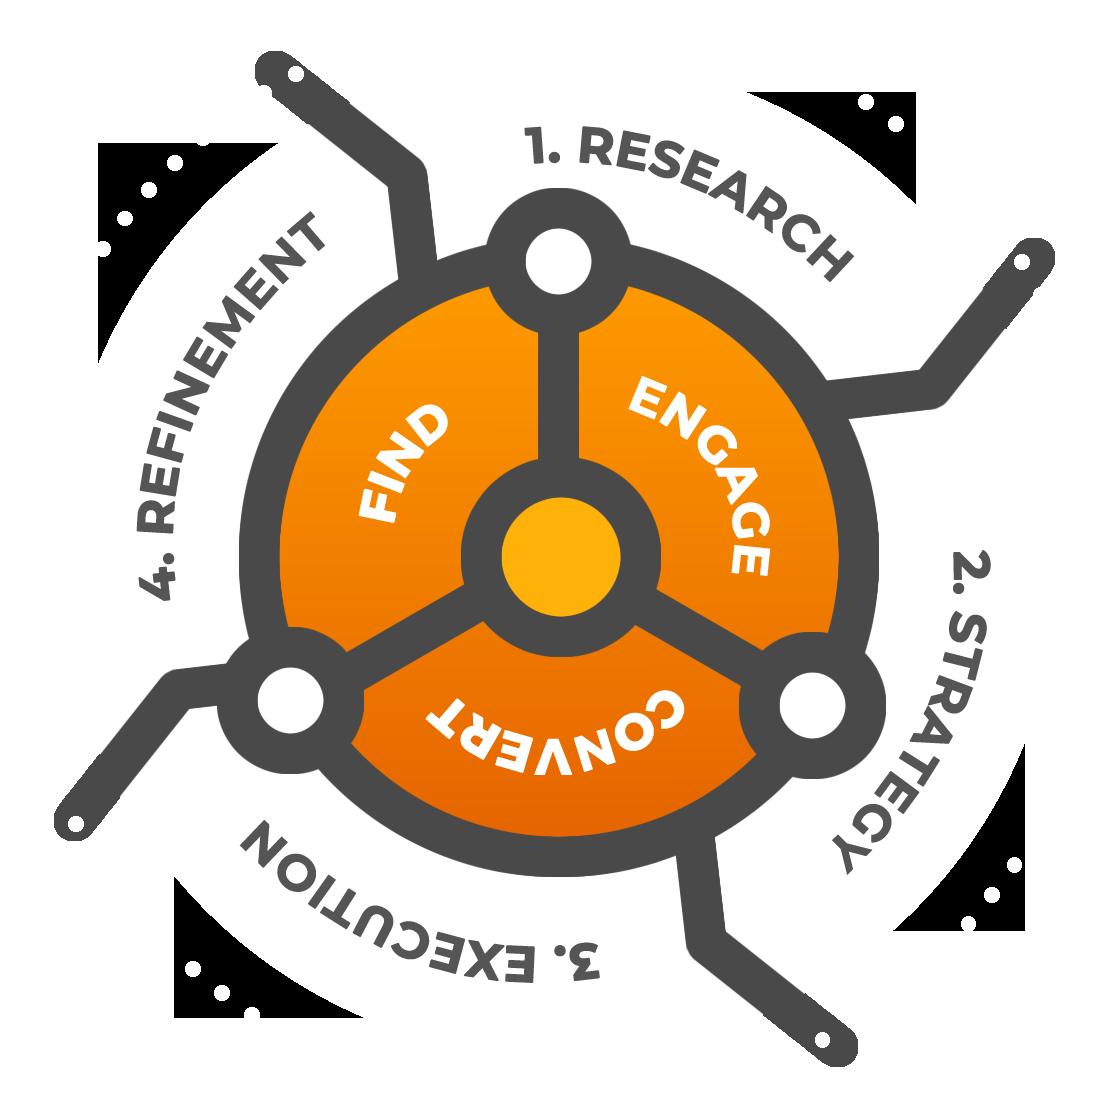 Pathfinder Methodology